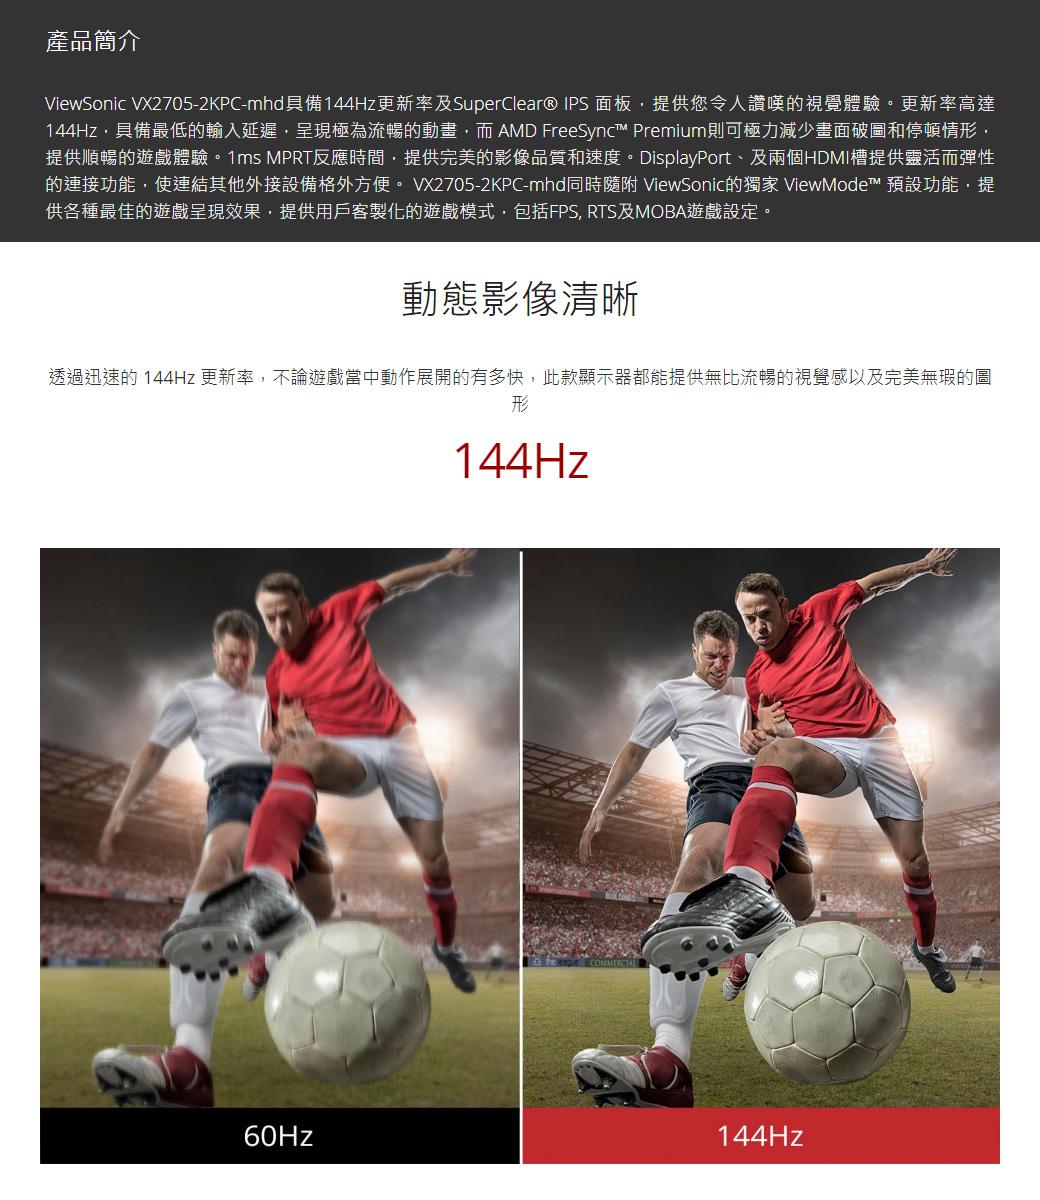 http://forum.sinya.com.tw/upload/attachment/2021/611ca85cdc7c82543.jpg